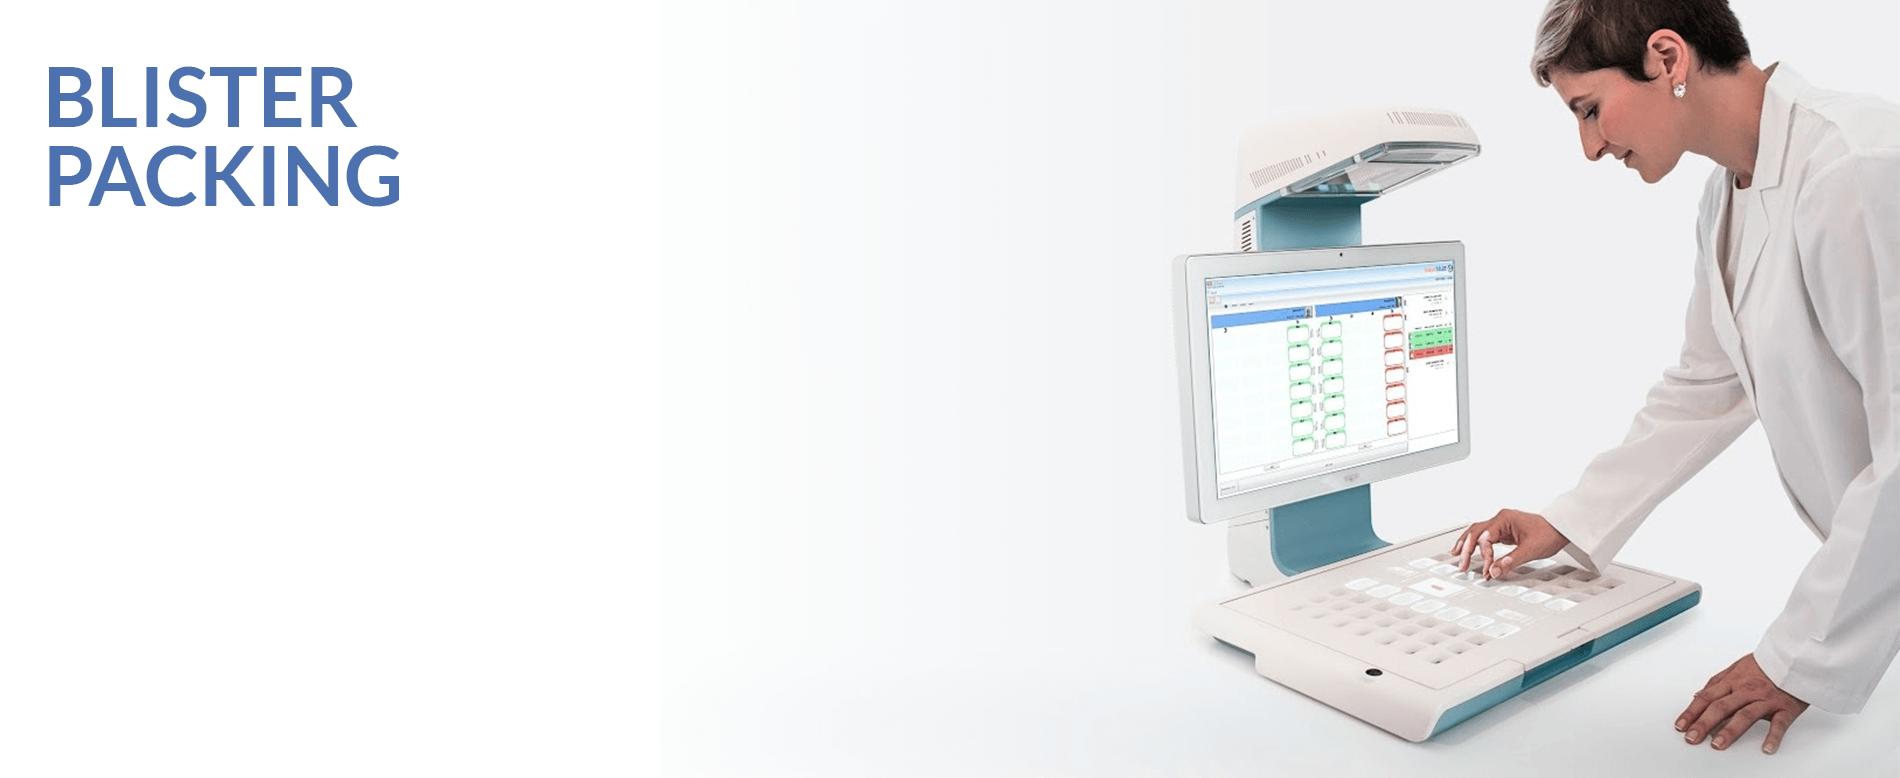 Pharmacy robotic automation in Australia